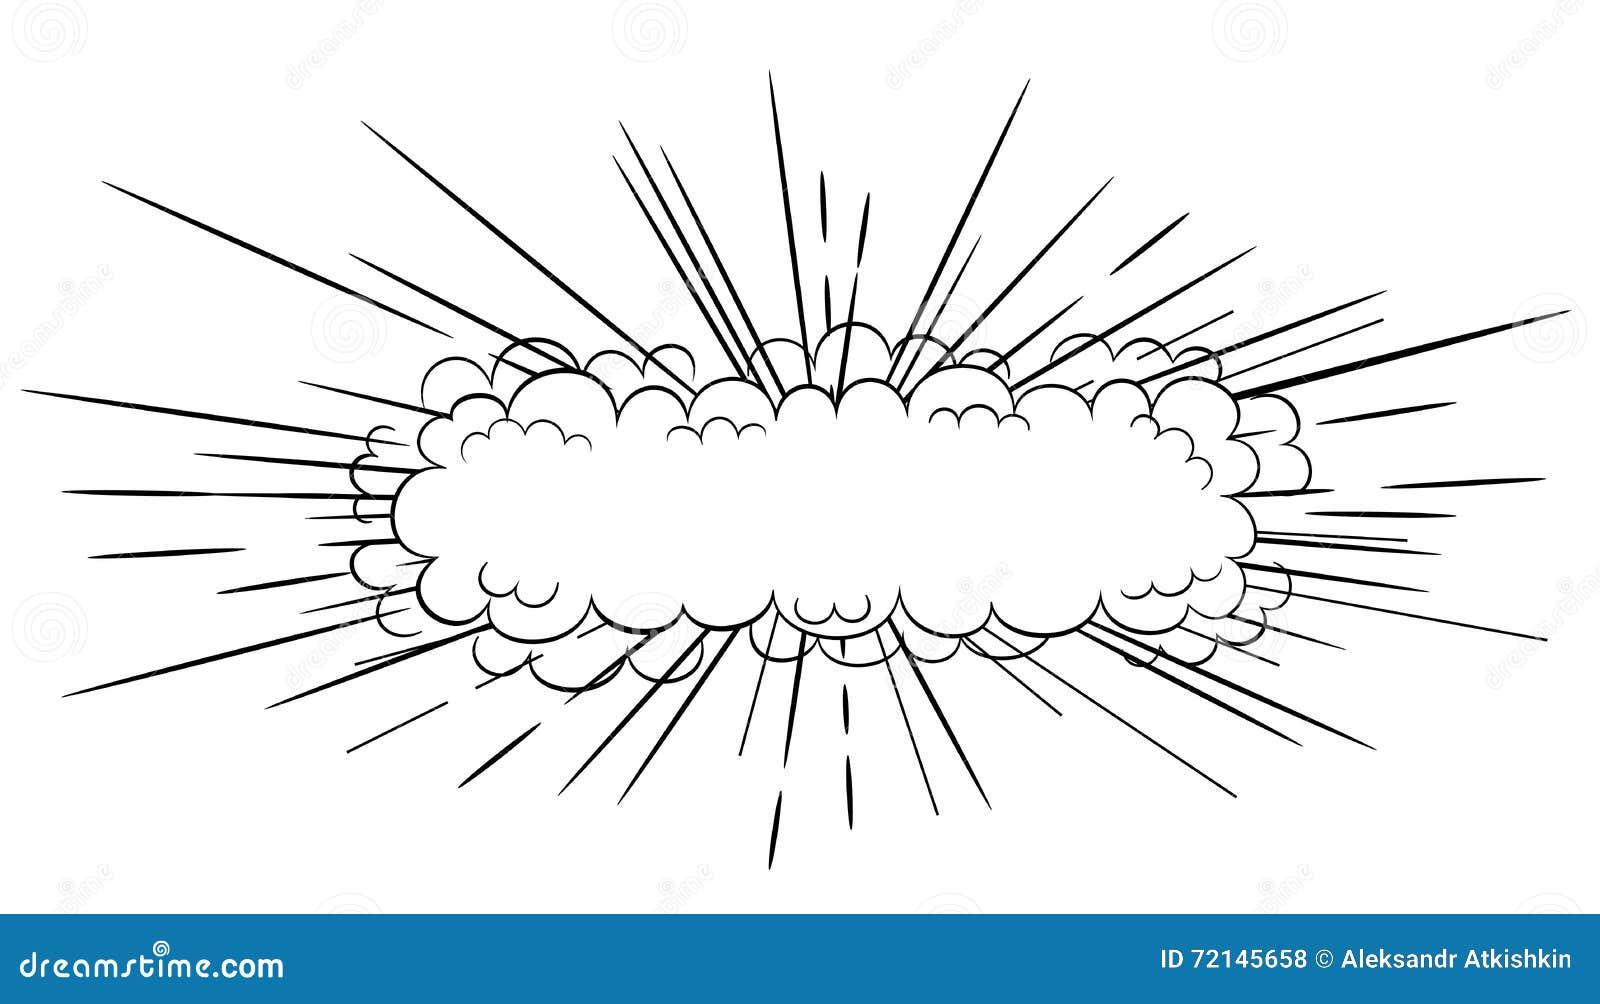 Explosao Comica Do Estilo Ilustracao Do Vetor Ilustracao De